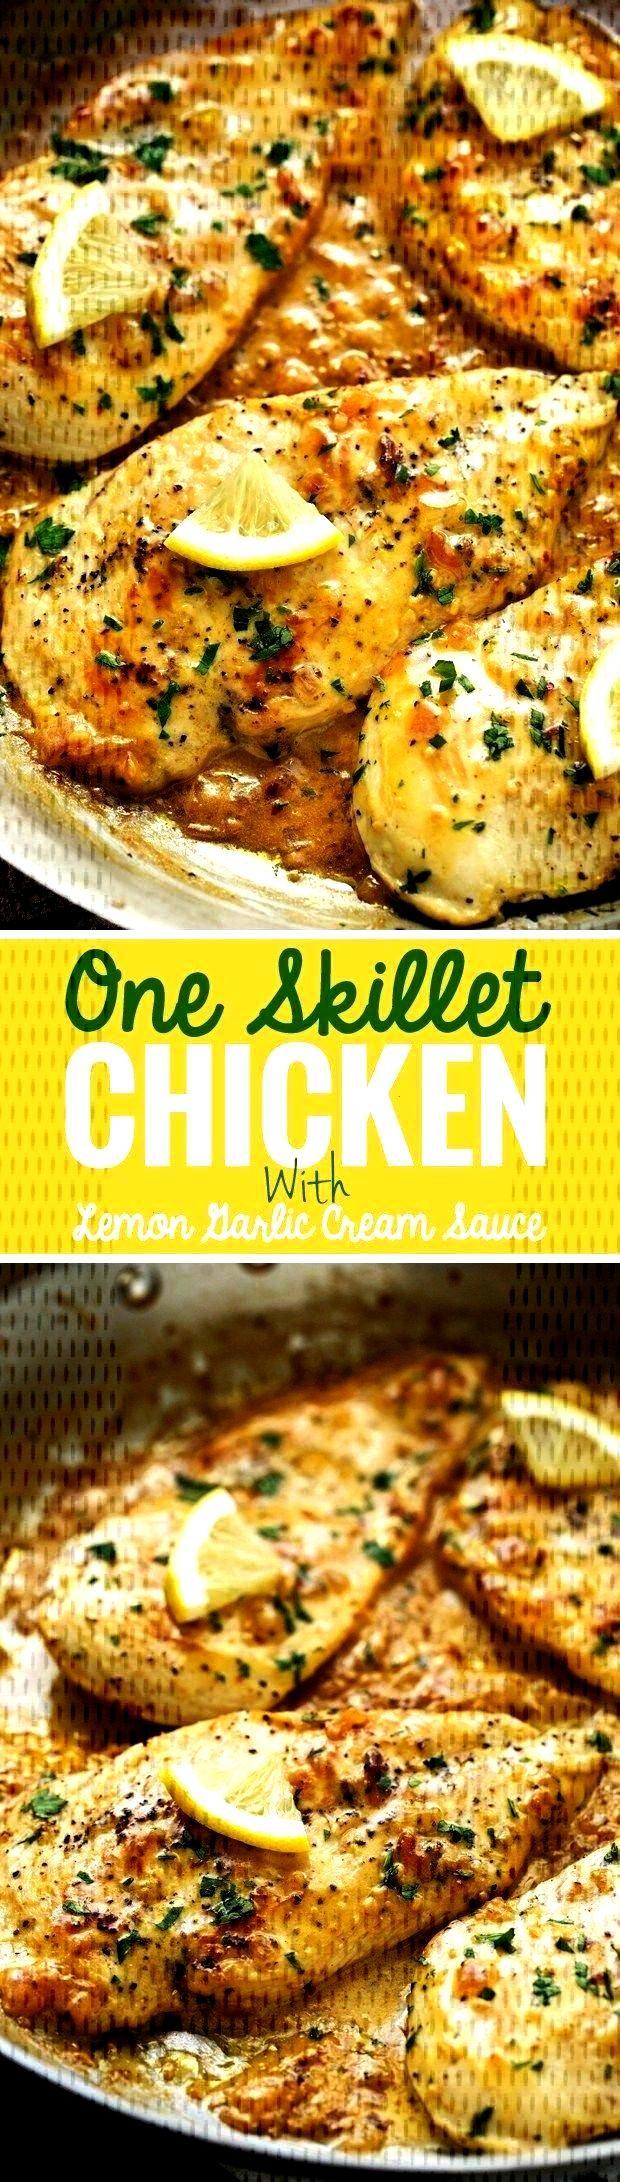 Skillet Chicken with Lemon Garlic Cream Sauce Recipe | Little Spice Jar  - Food and Drink -One Skil